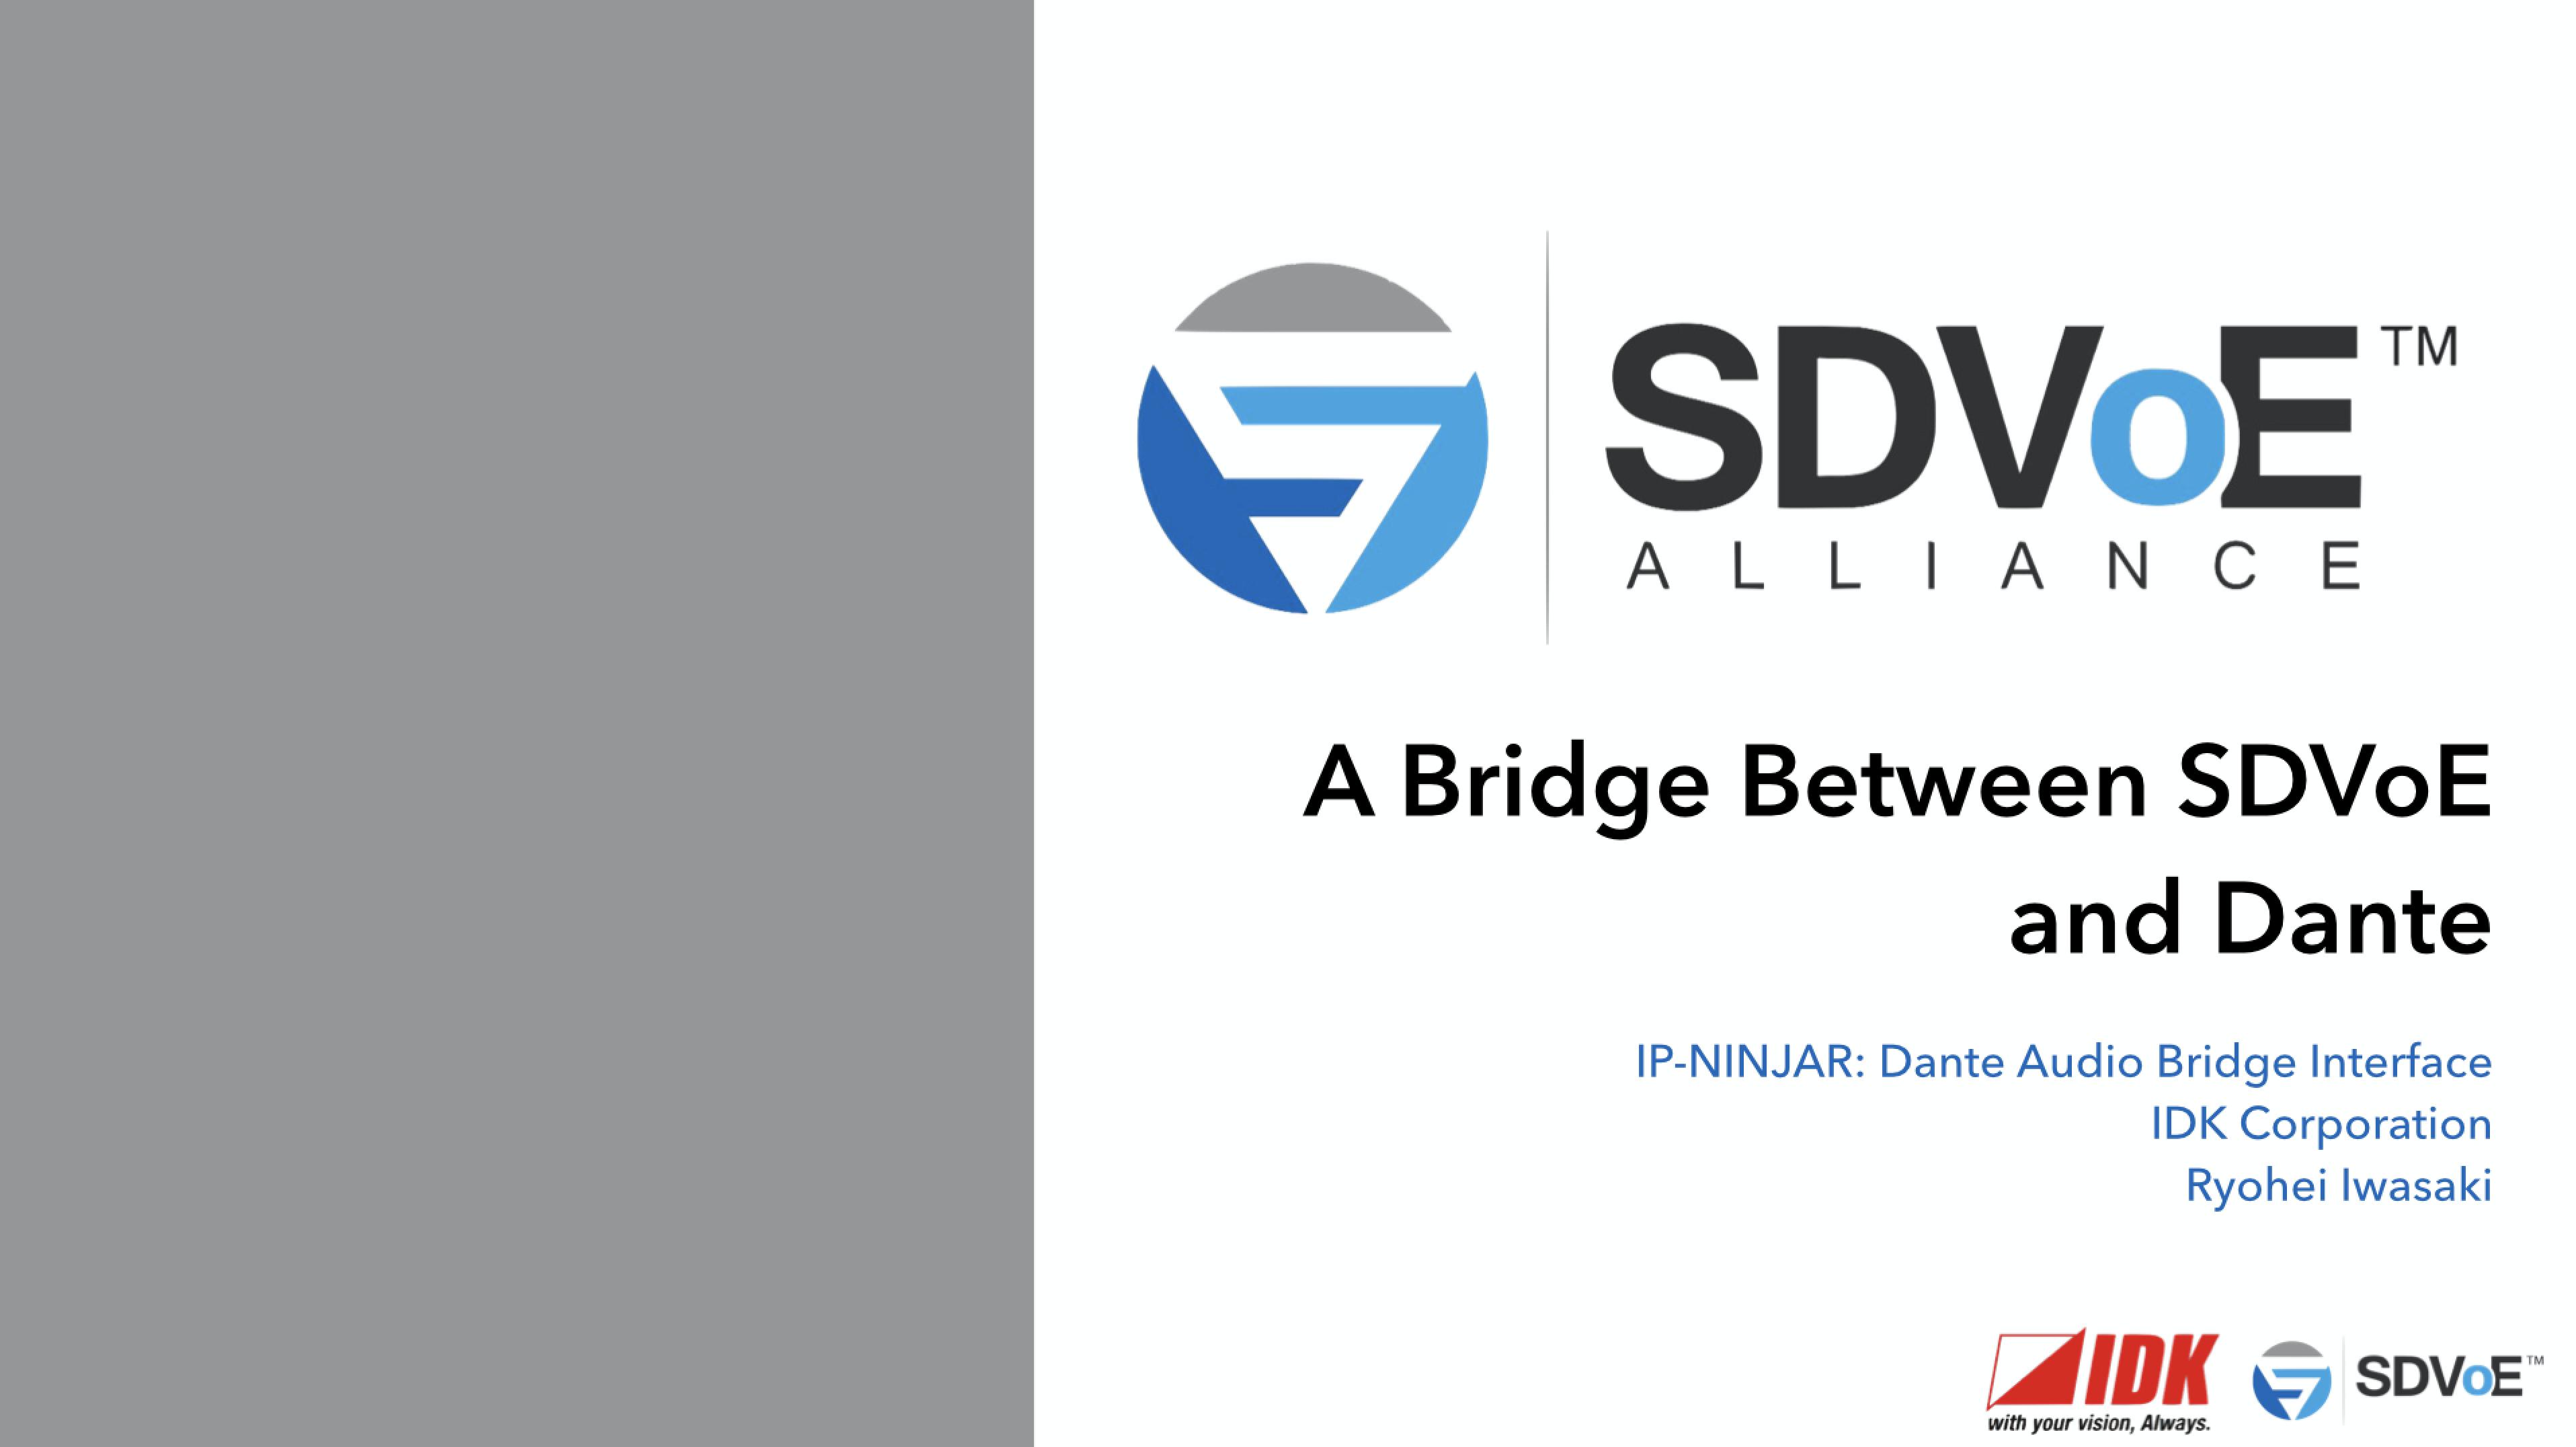 Integrated AV - A Bridge Between Dante and SDVoE